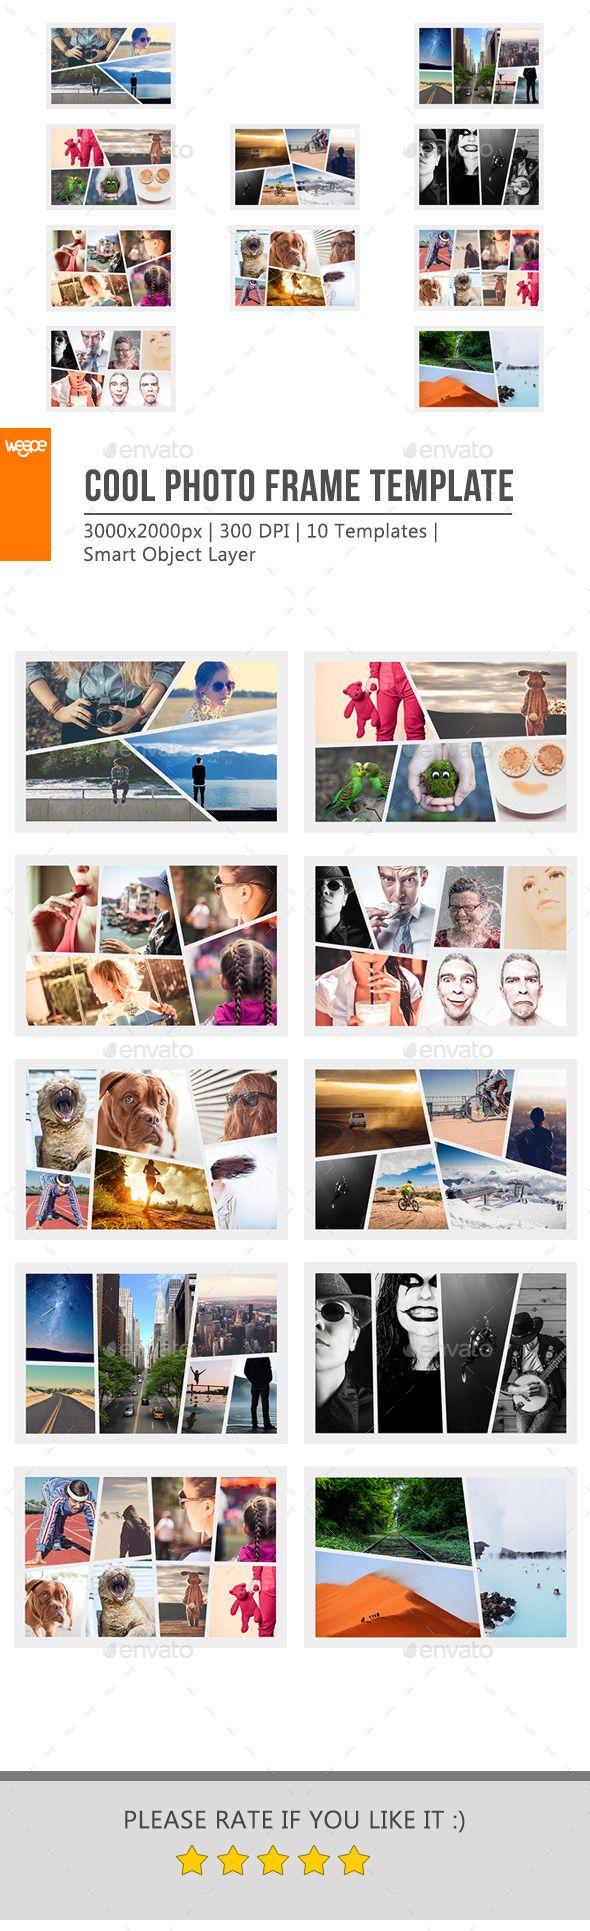 Cool Photo Frame Template | Anuarios, Formato y Álbum